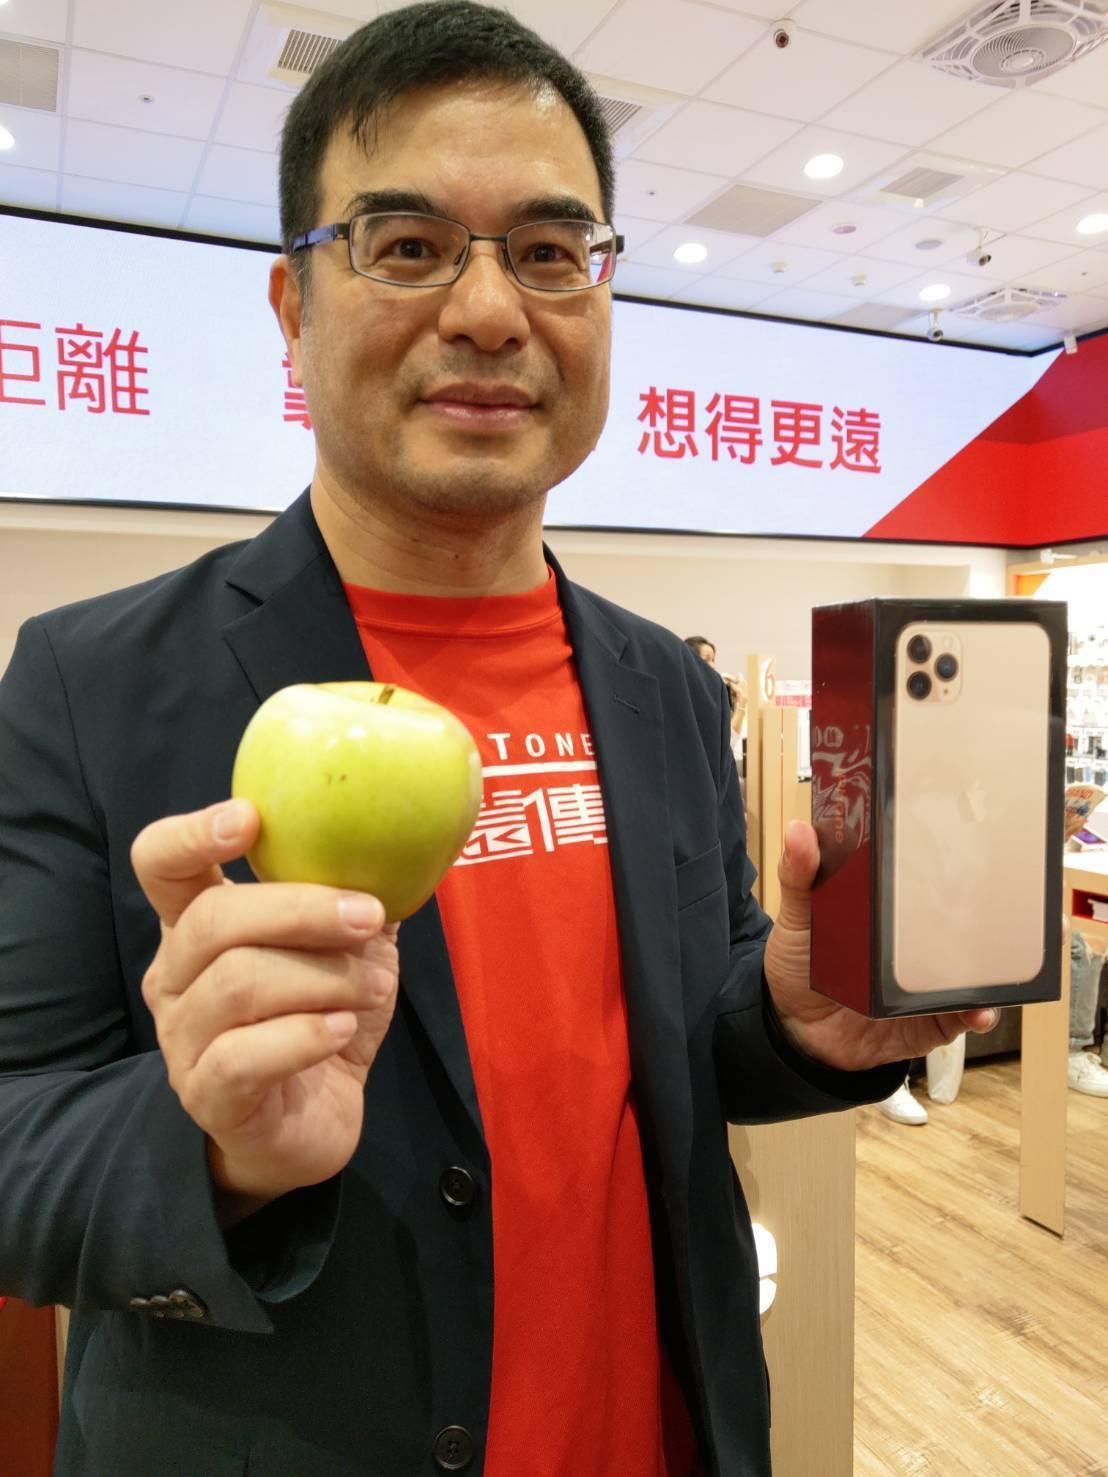 iPhone 11開賣,「夜幕綠」最搶手,遠傳個人用戶事業群行動裝置管理處副總杜...